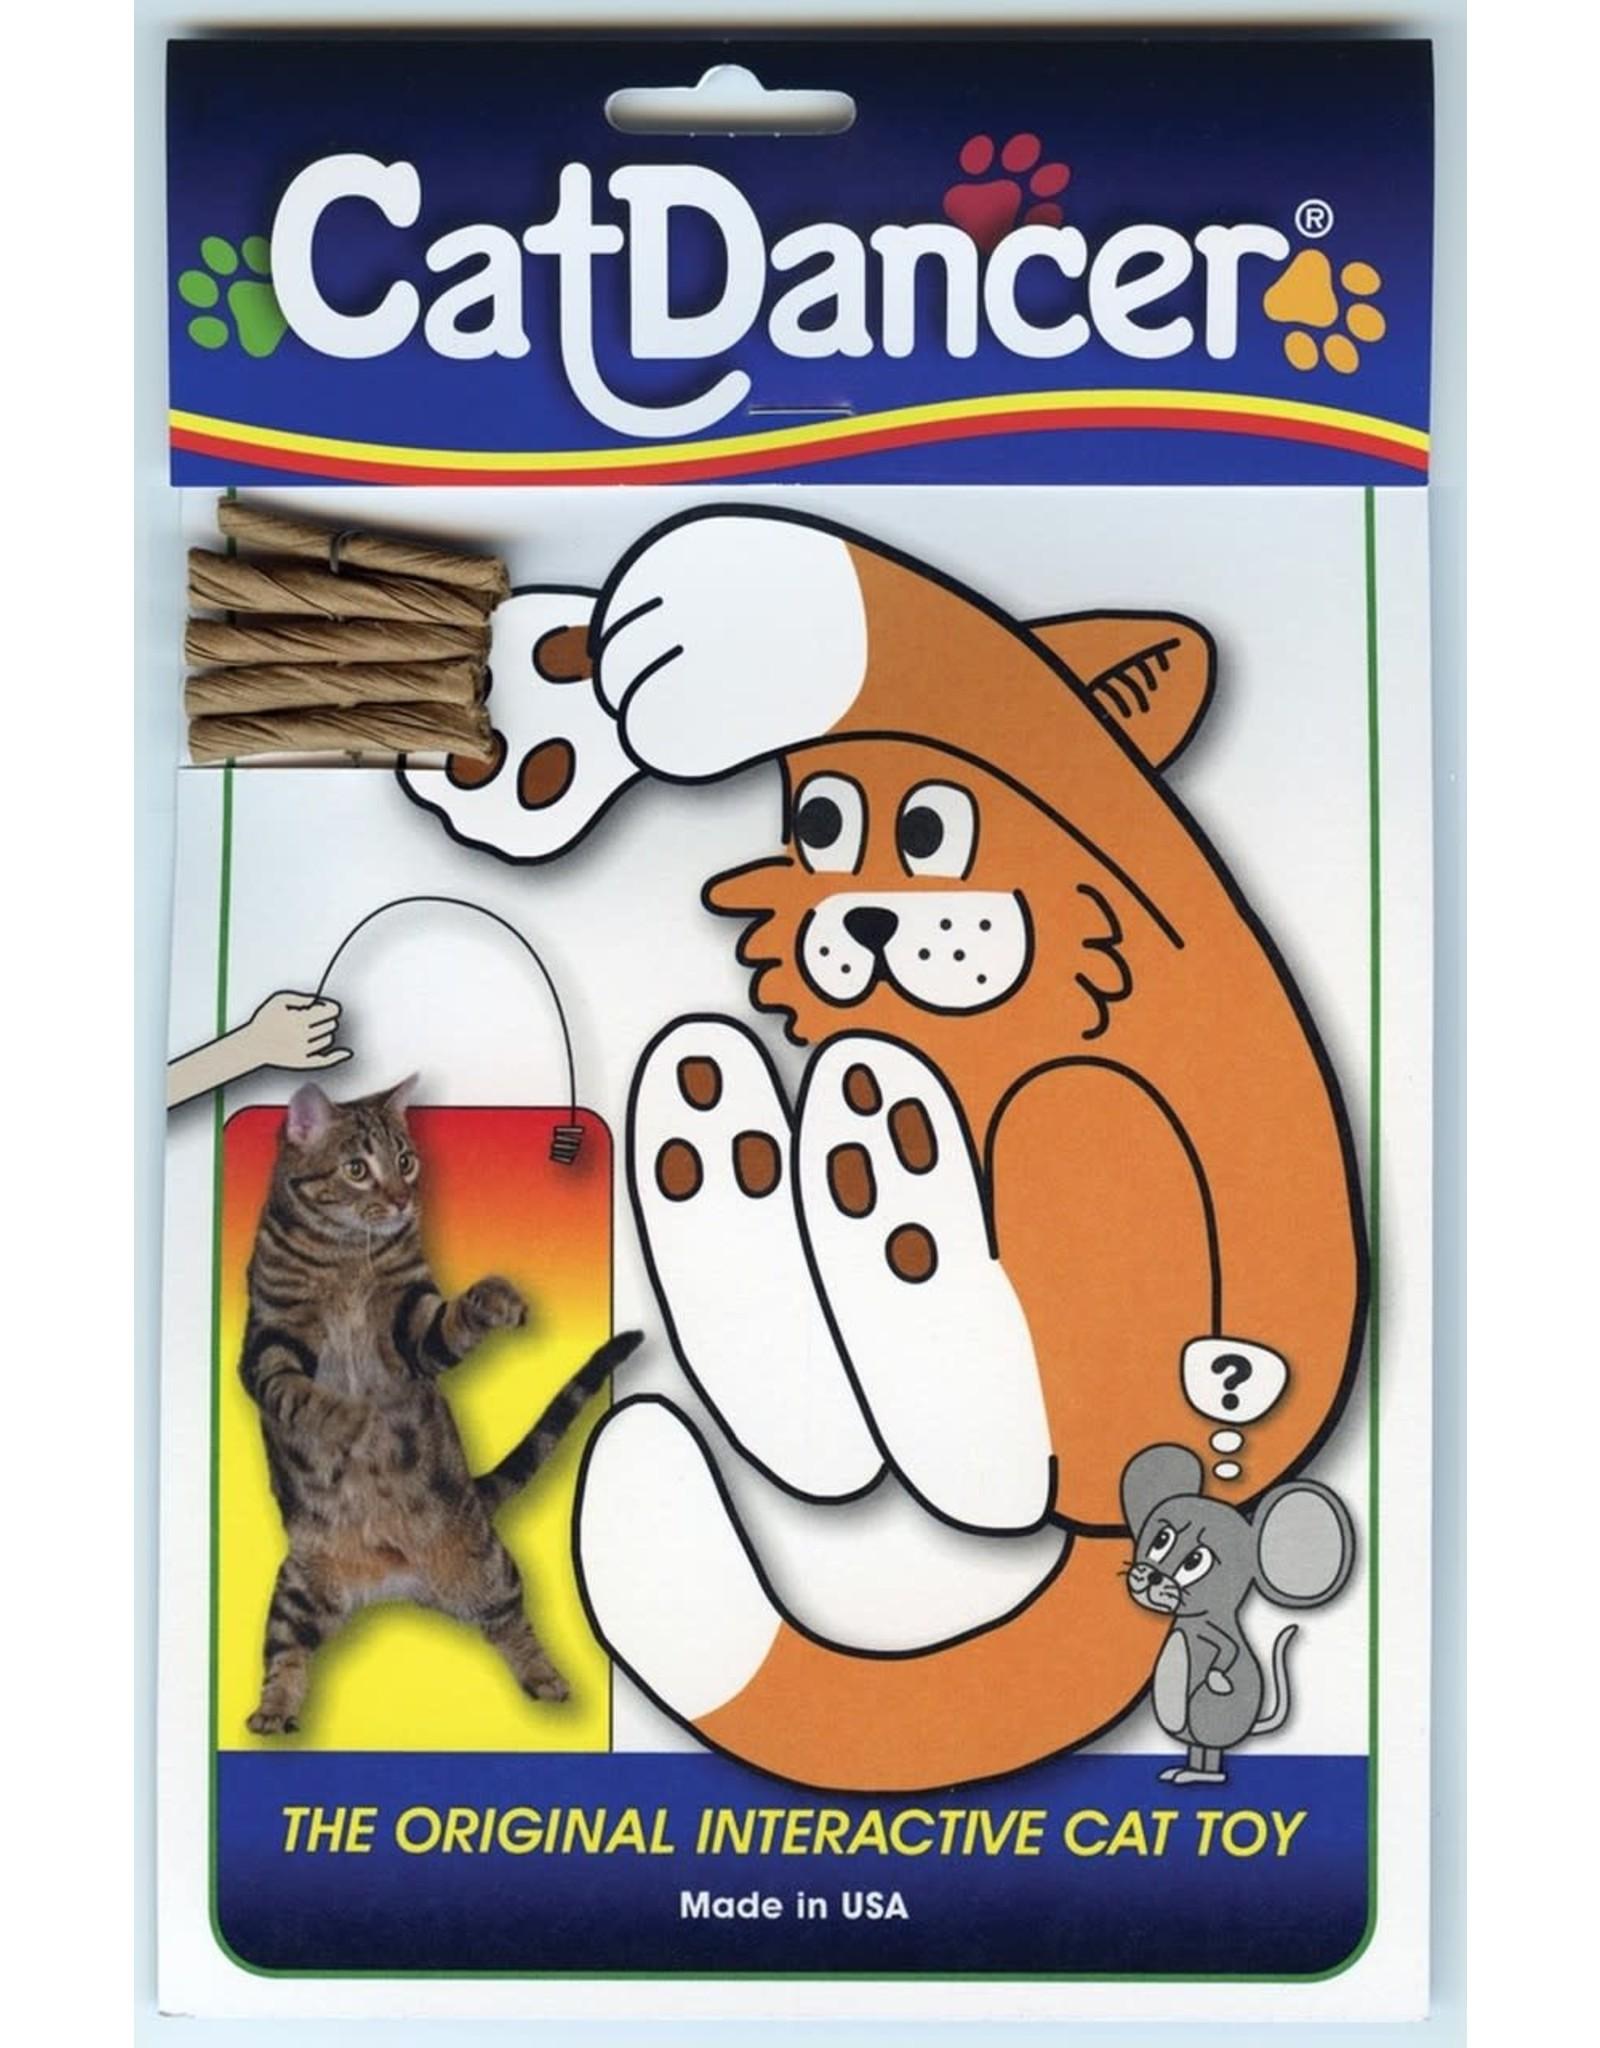 Cat Dancer CAT DANCER THE ORIGINAL INTERACTIVE CAT TOY